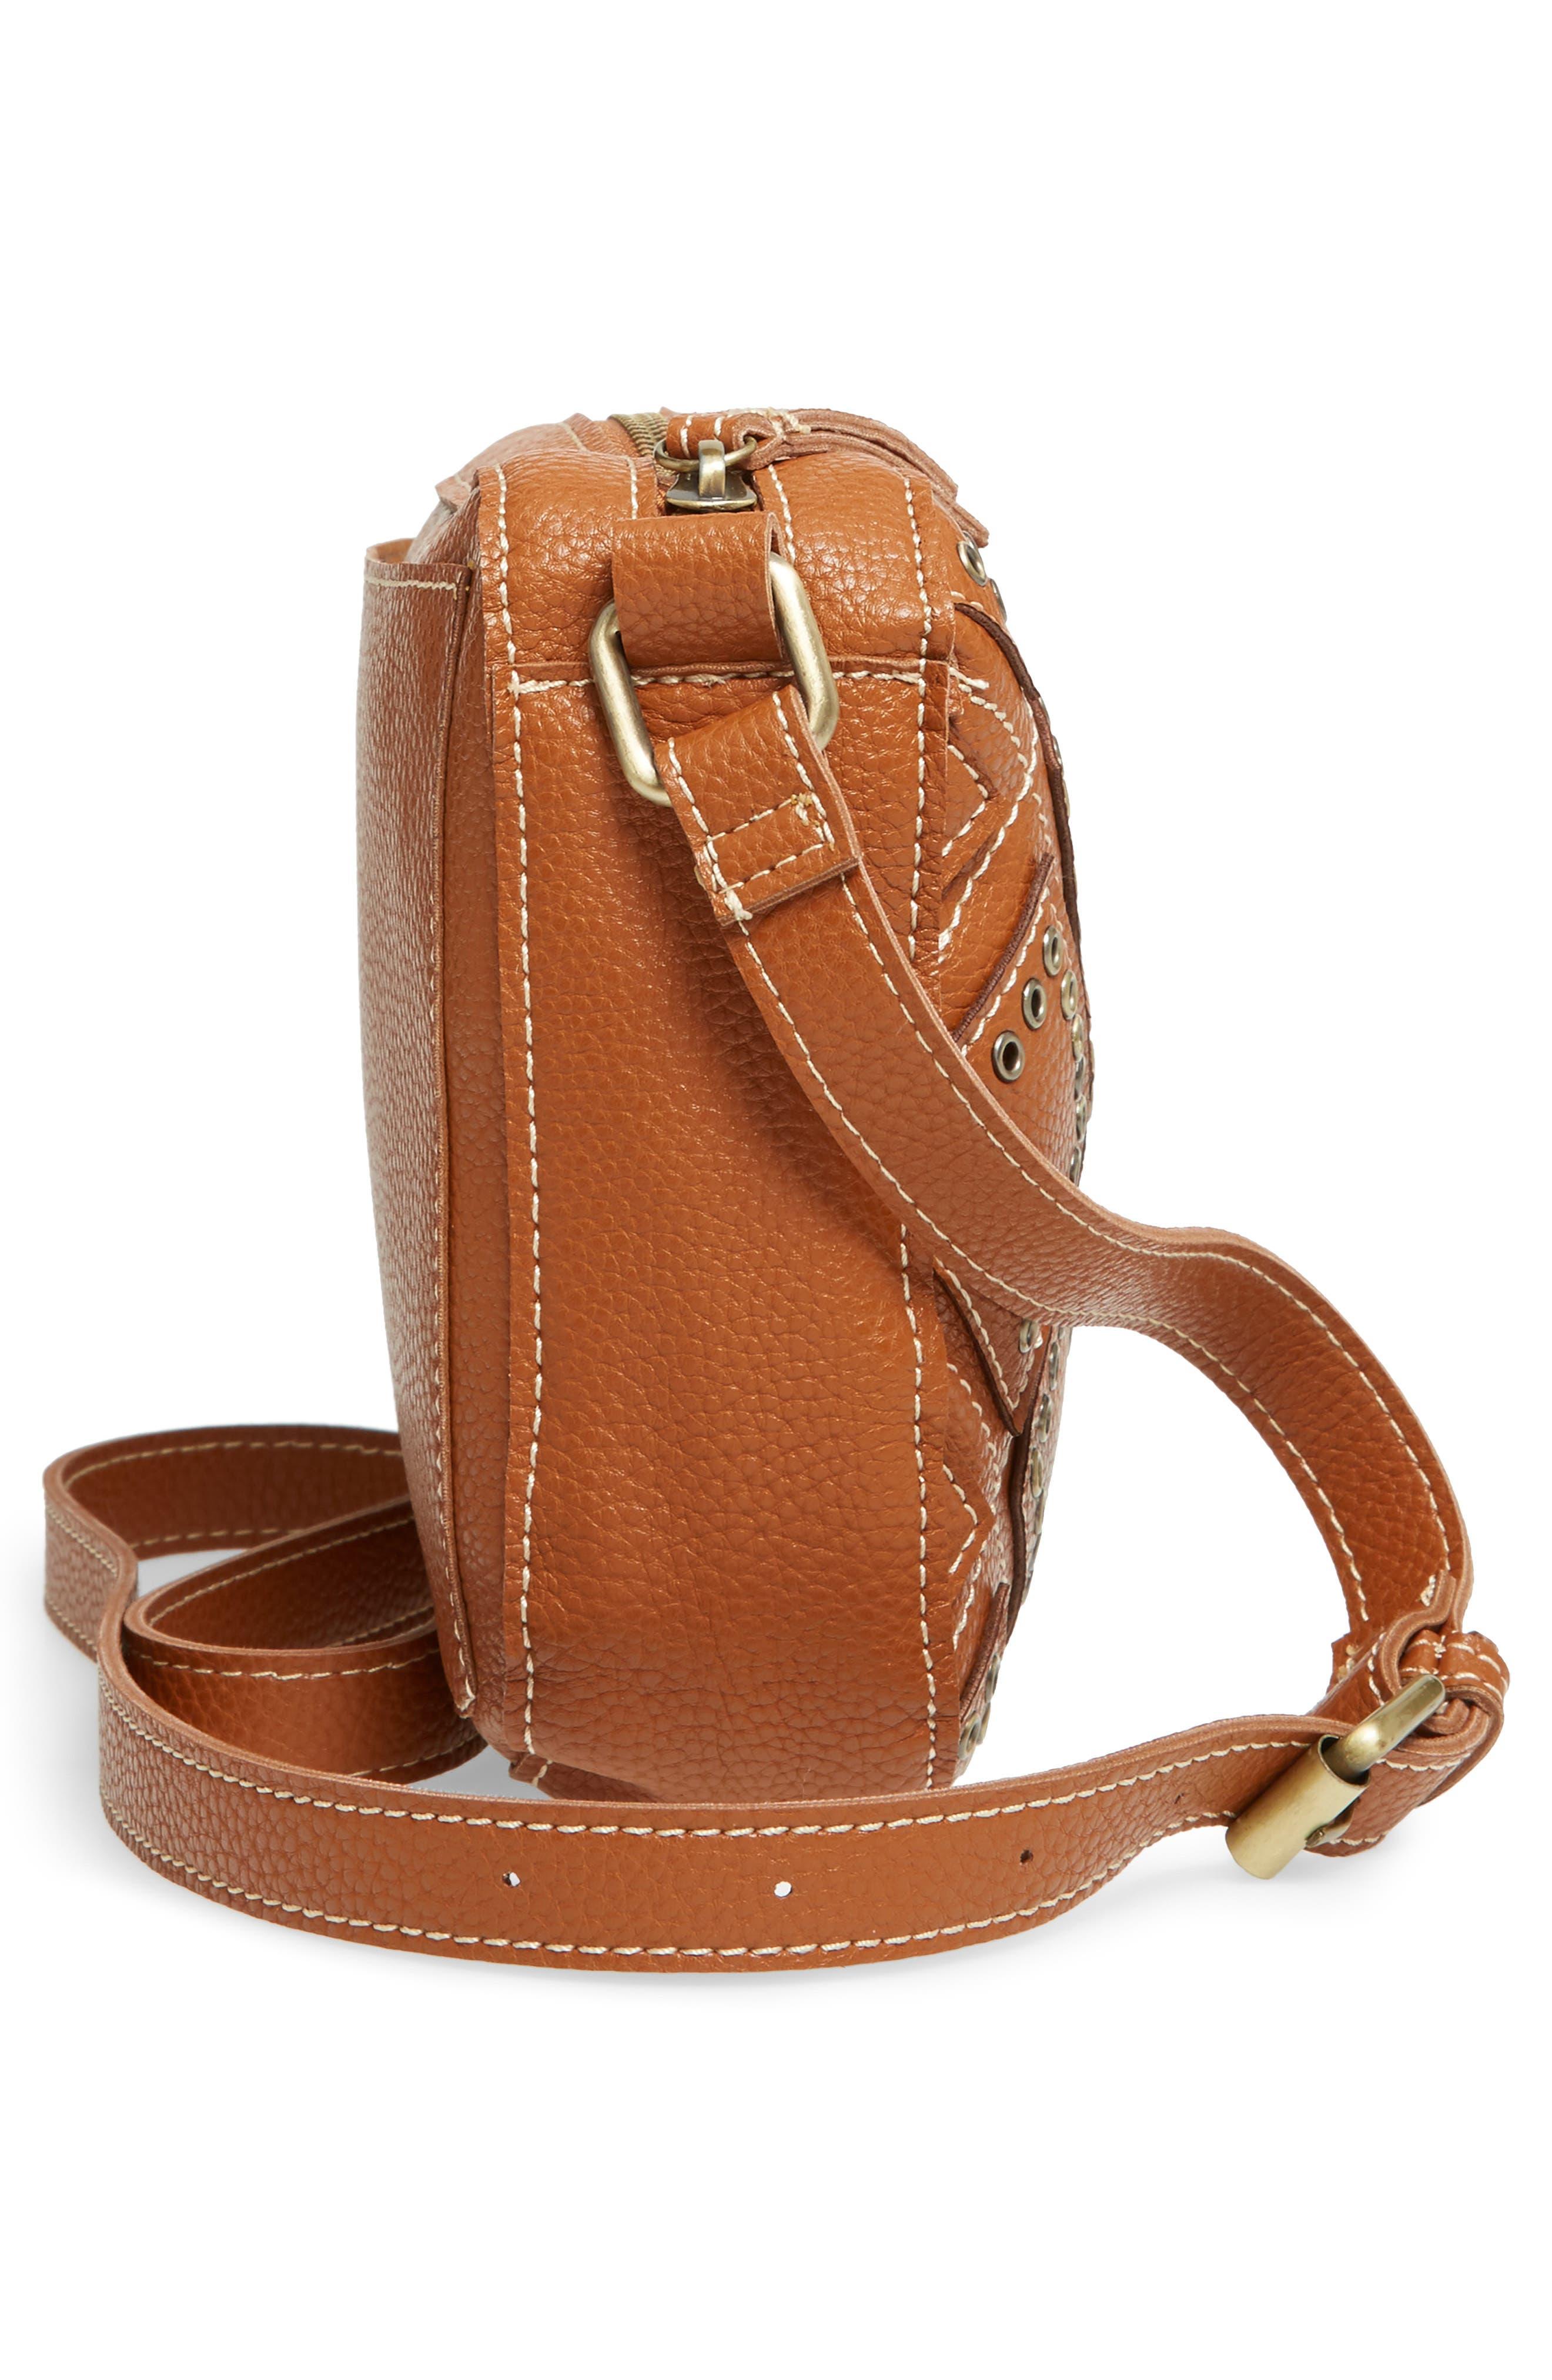 Skylar Faux Leather Crossbody Bag,                             Alternate thumbnail 5, color,